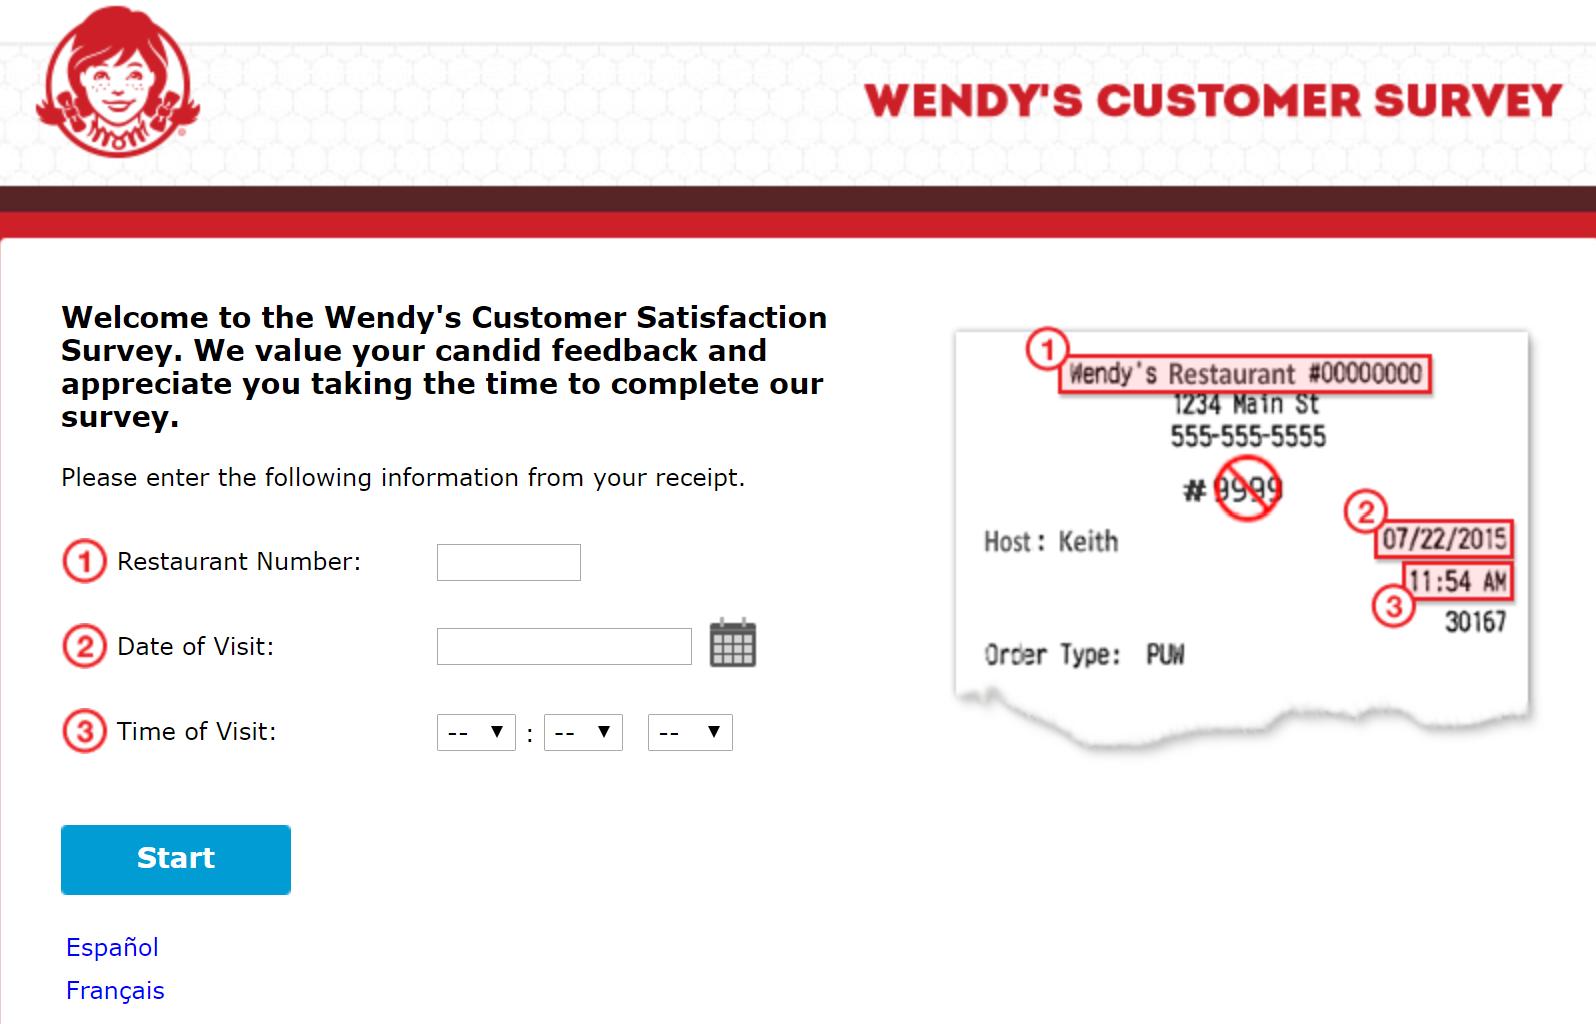 talktowendys customer survey